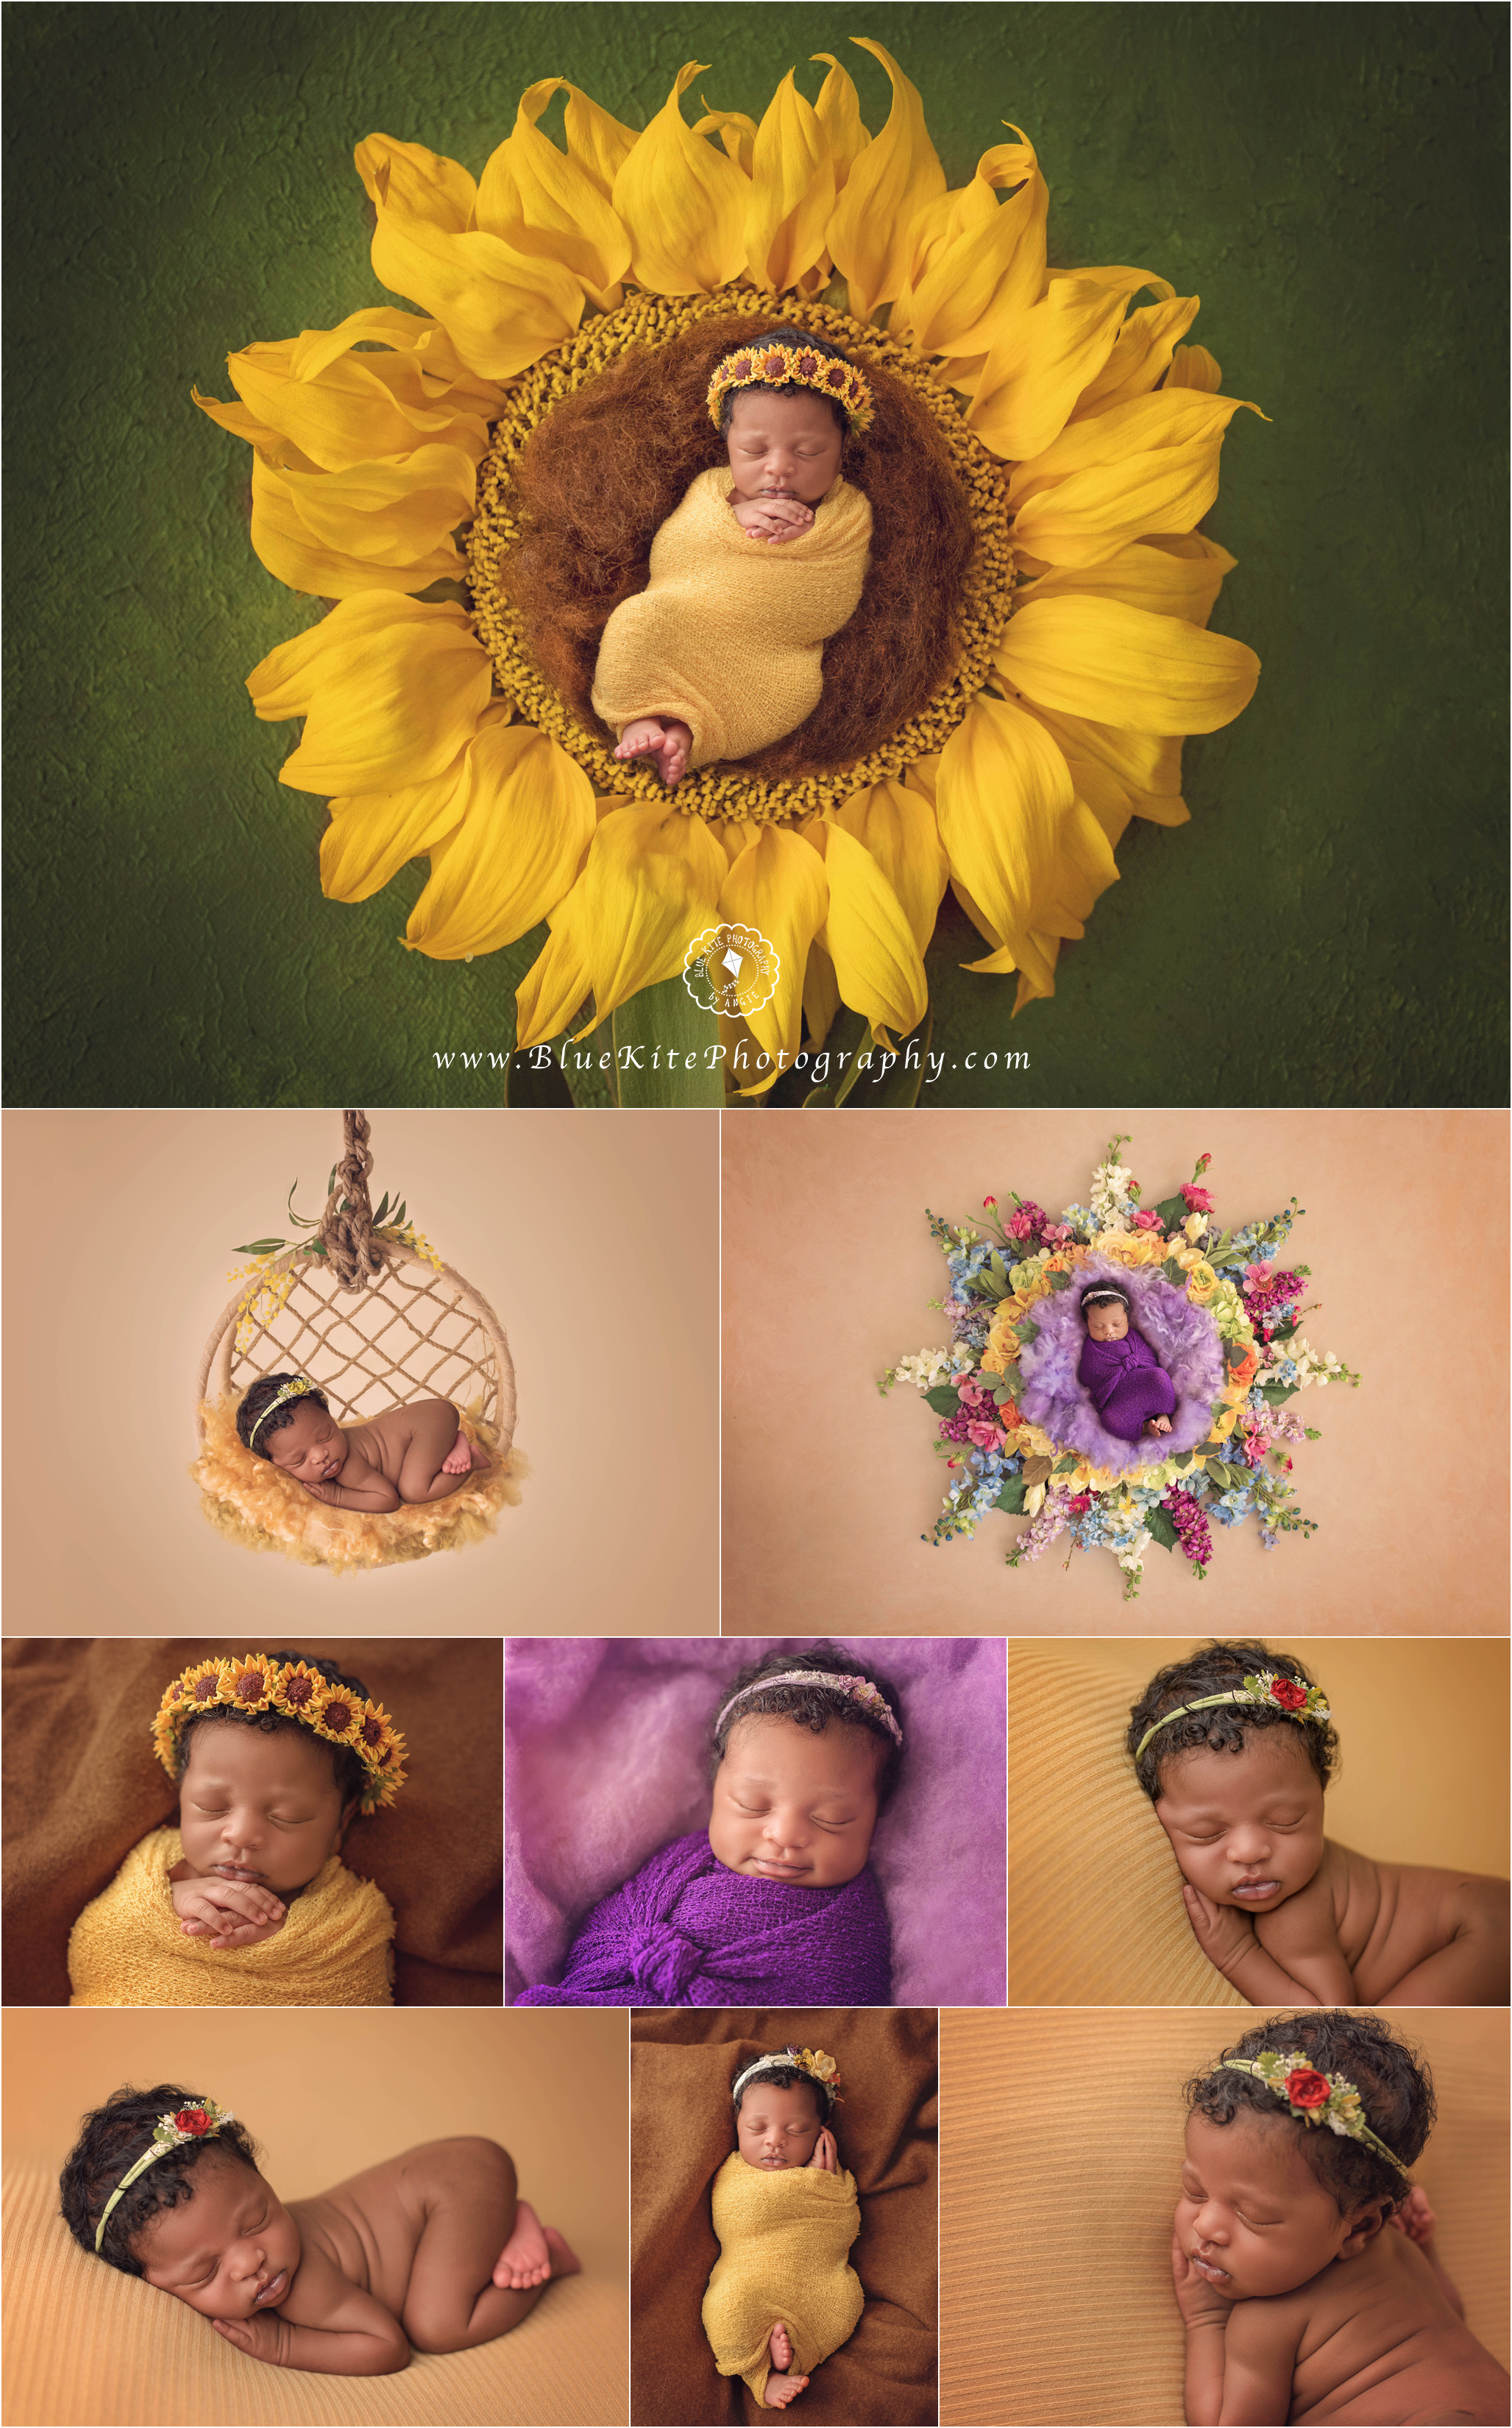 Newborn photographer, newborn session, newborn photography in Boca Raton, Coral Springs, Deerfield, Delray Beach, Boynton Beach, Parkland, South Florida.